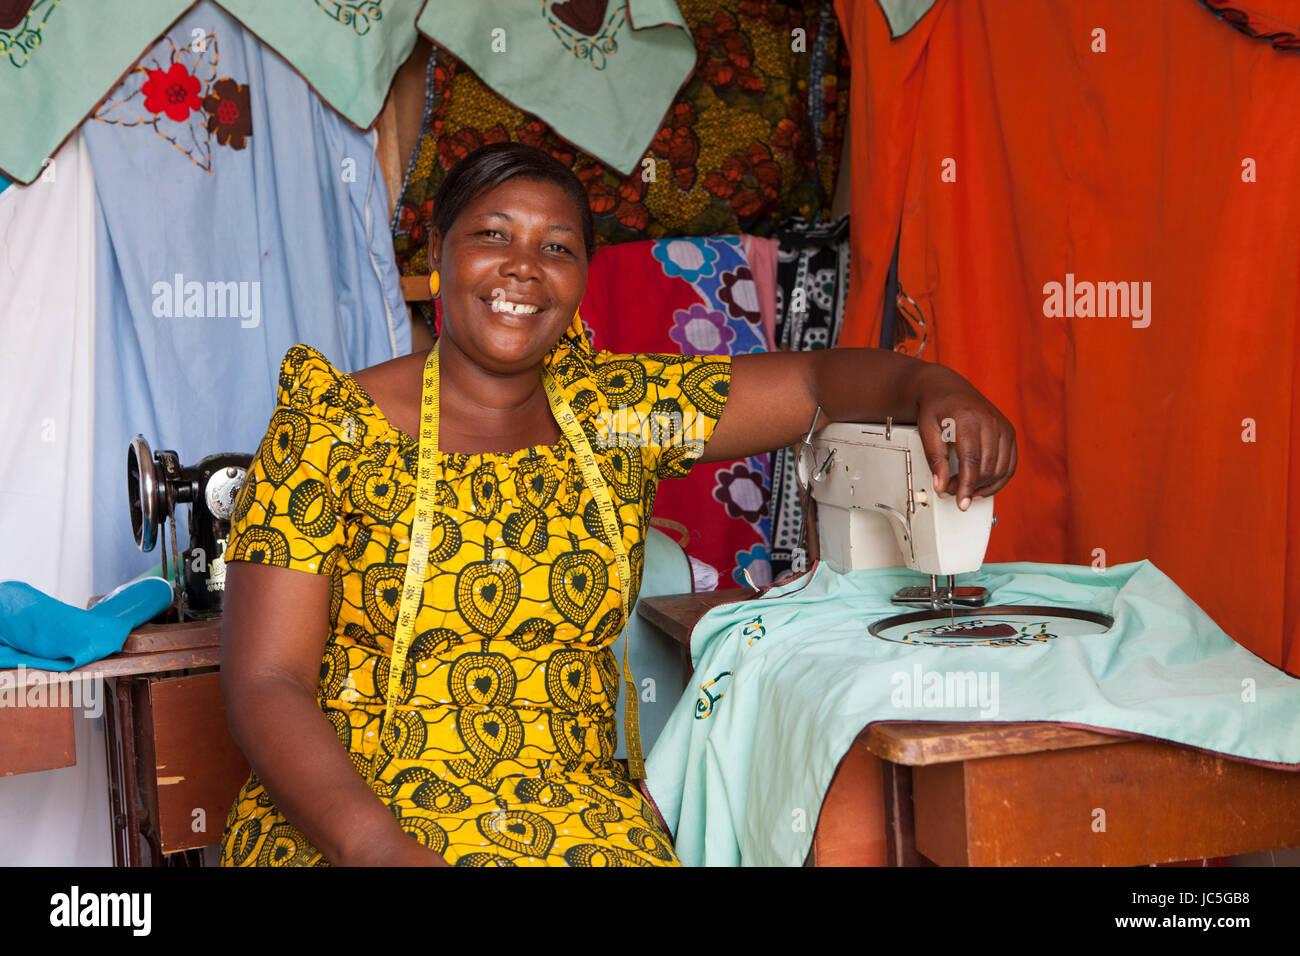 Female tailor, Tanzania, Africa. - Stock Image